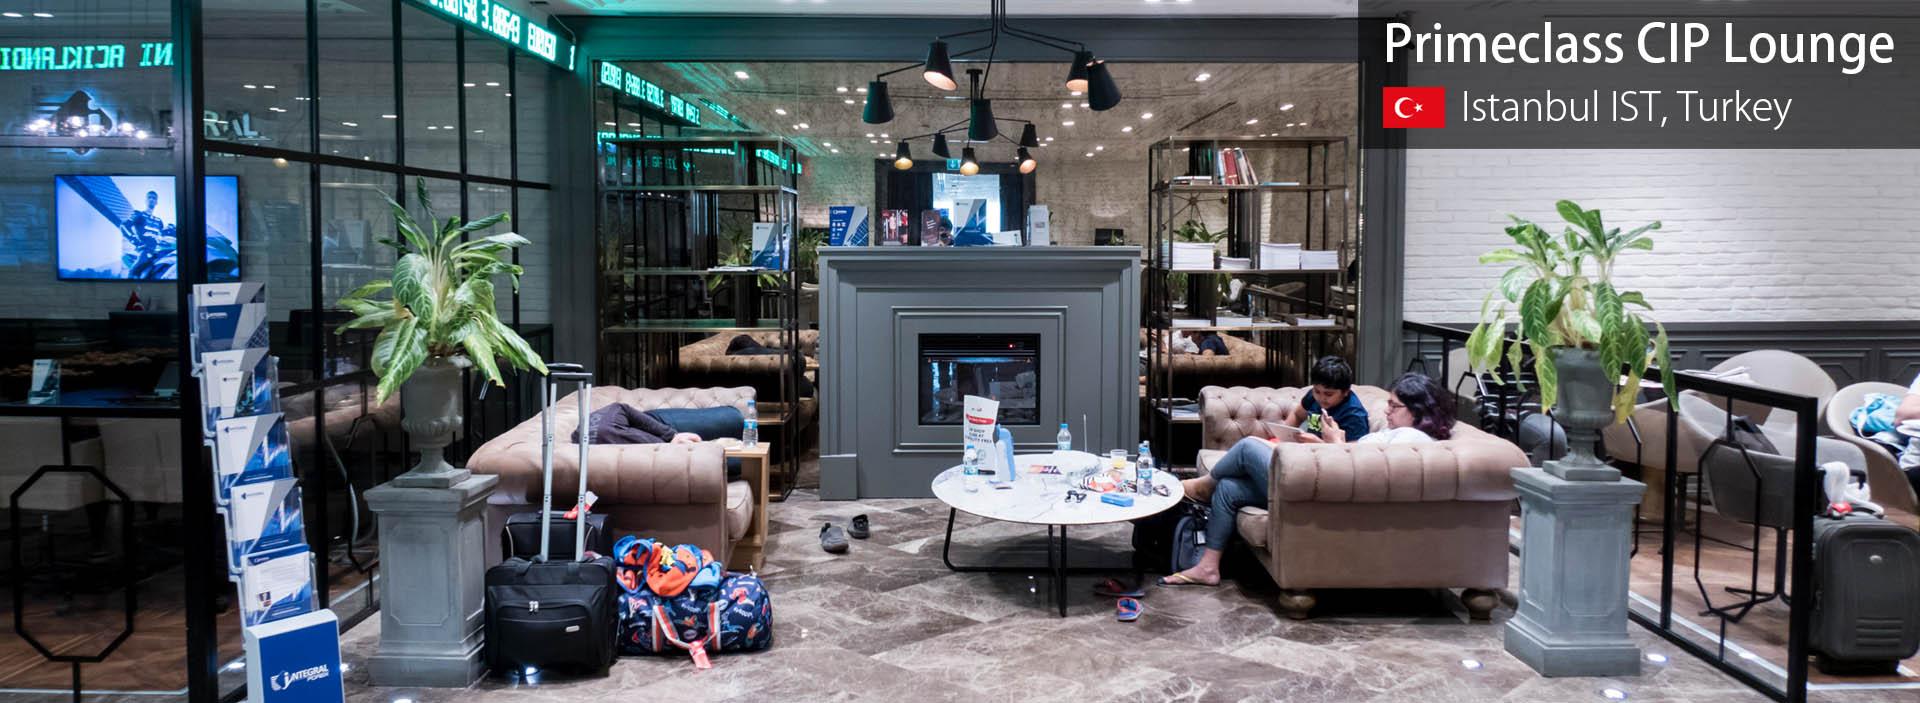 Lounge Review: Primeclass CIP Lounge at Istanbul Ataturk